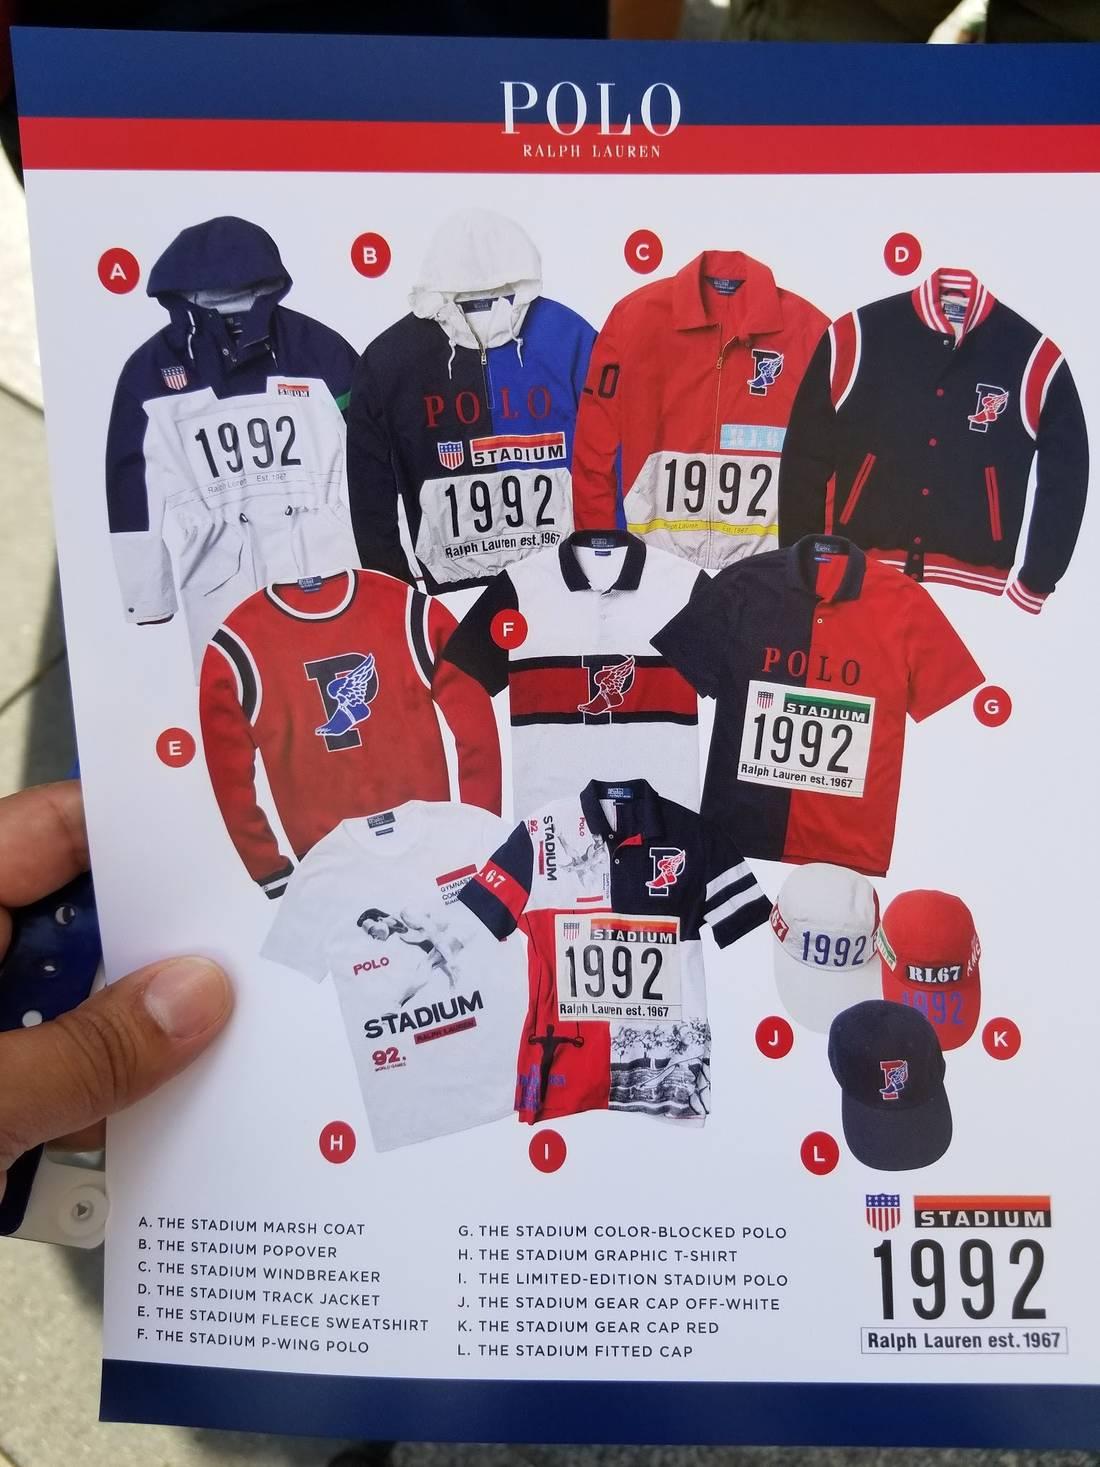 ... low price polo ralph lauren 1992 p wing stadium fleece sweatshirt red  small size us s f950bb17f40